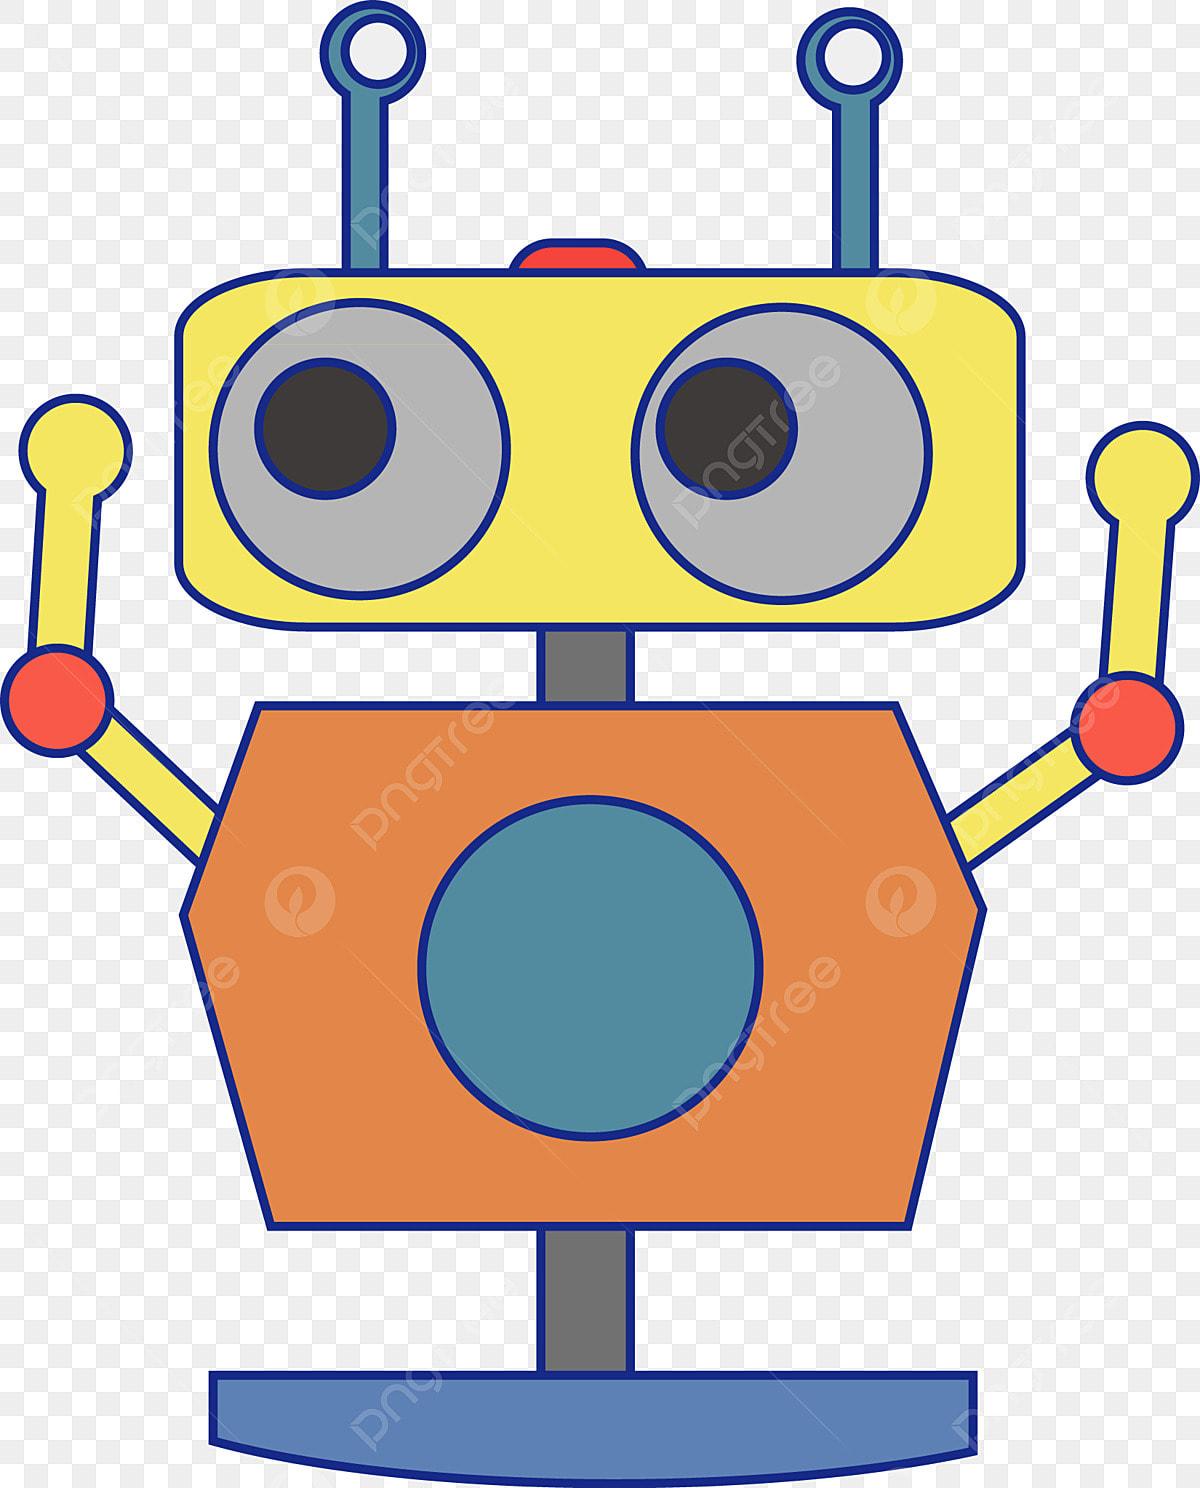 Robo Dos Desenhos Animados Robo De Brinquedo Robo Toy Ilustracao